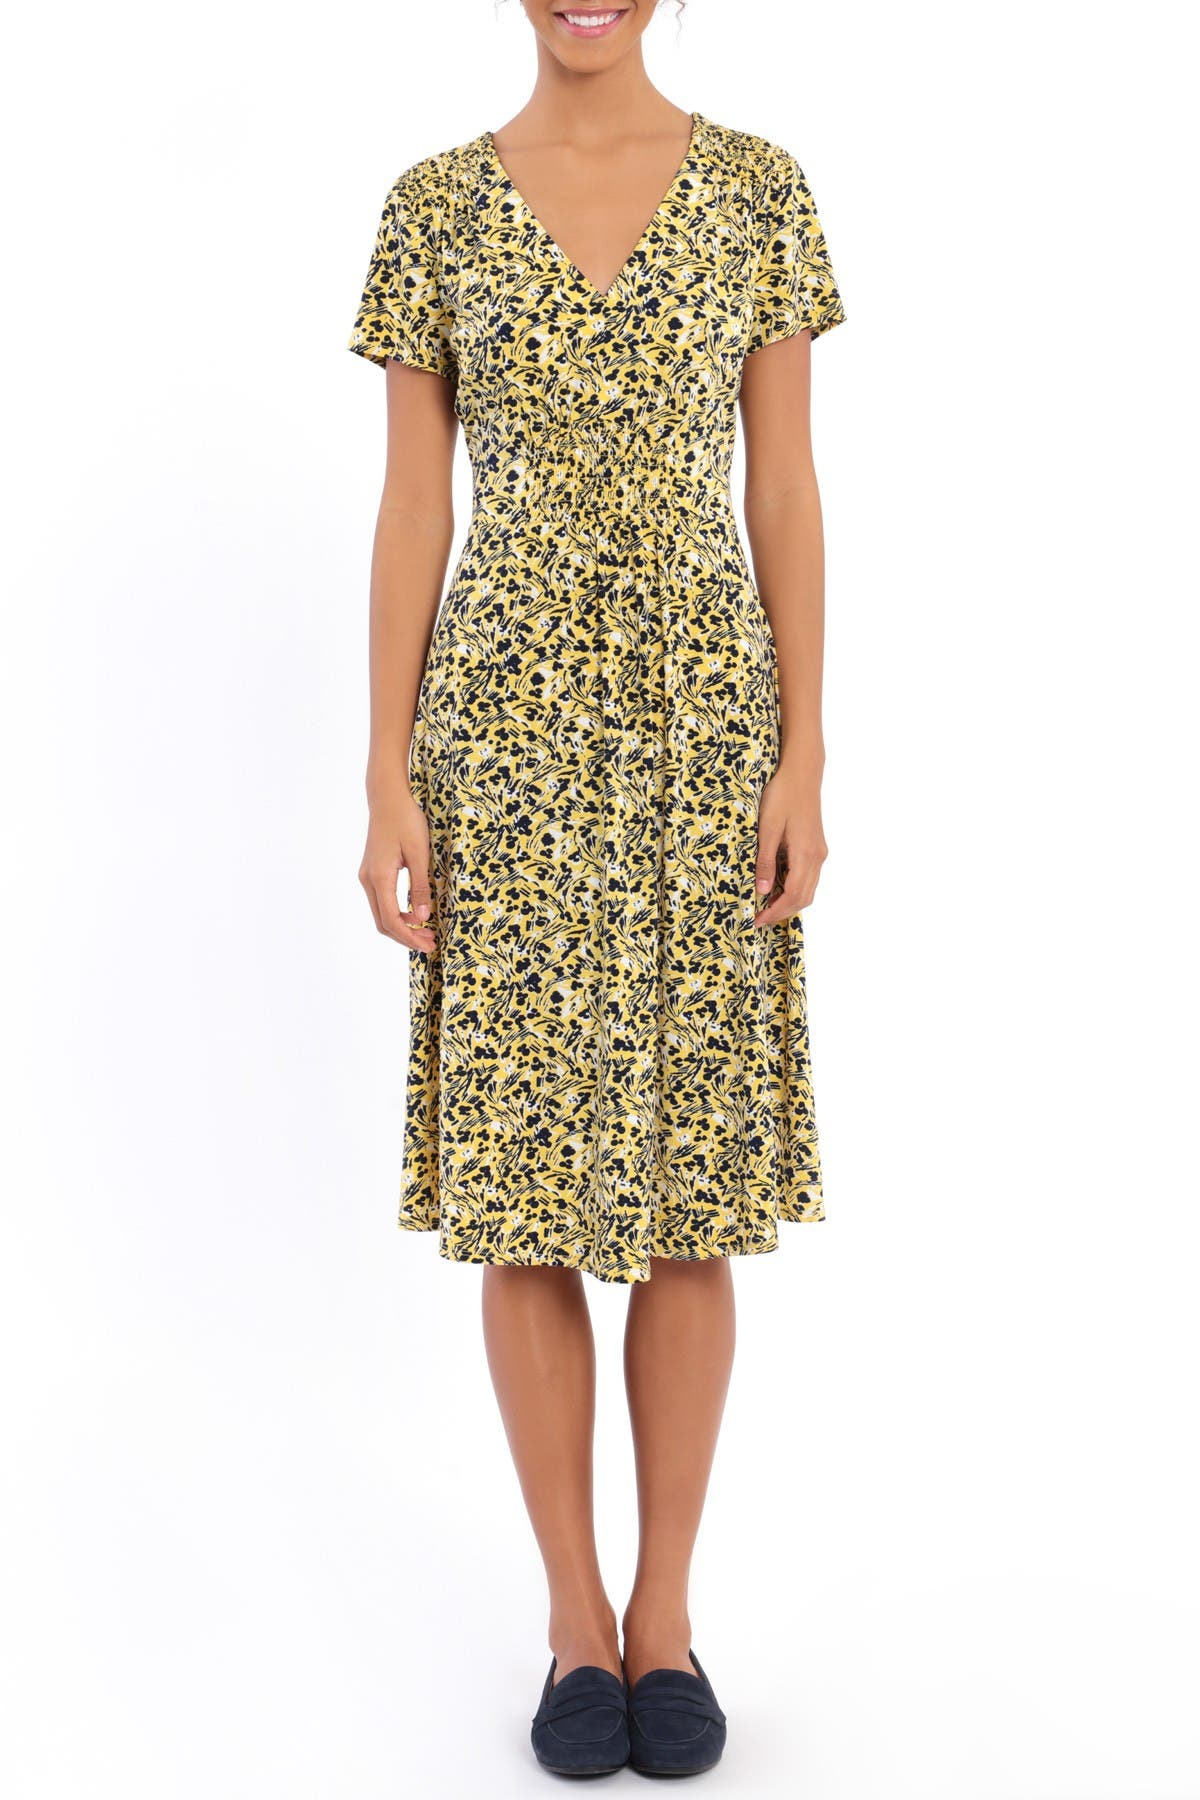 Image of London Times Floral Smocked Midi Dress